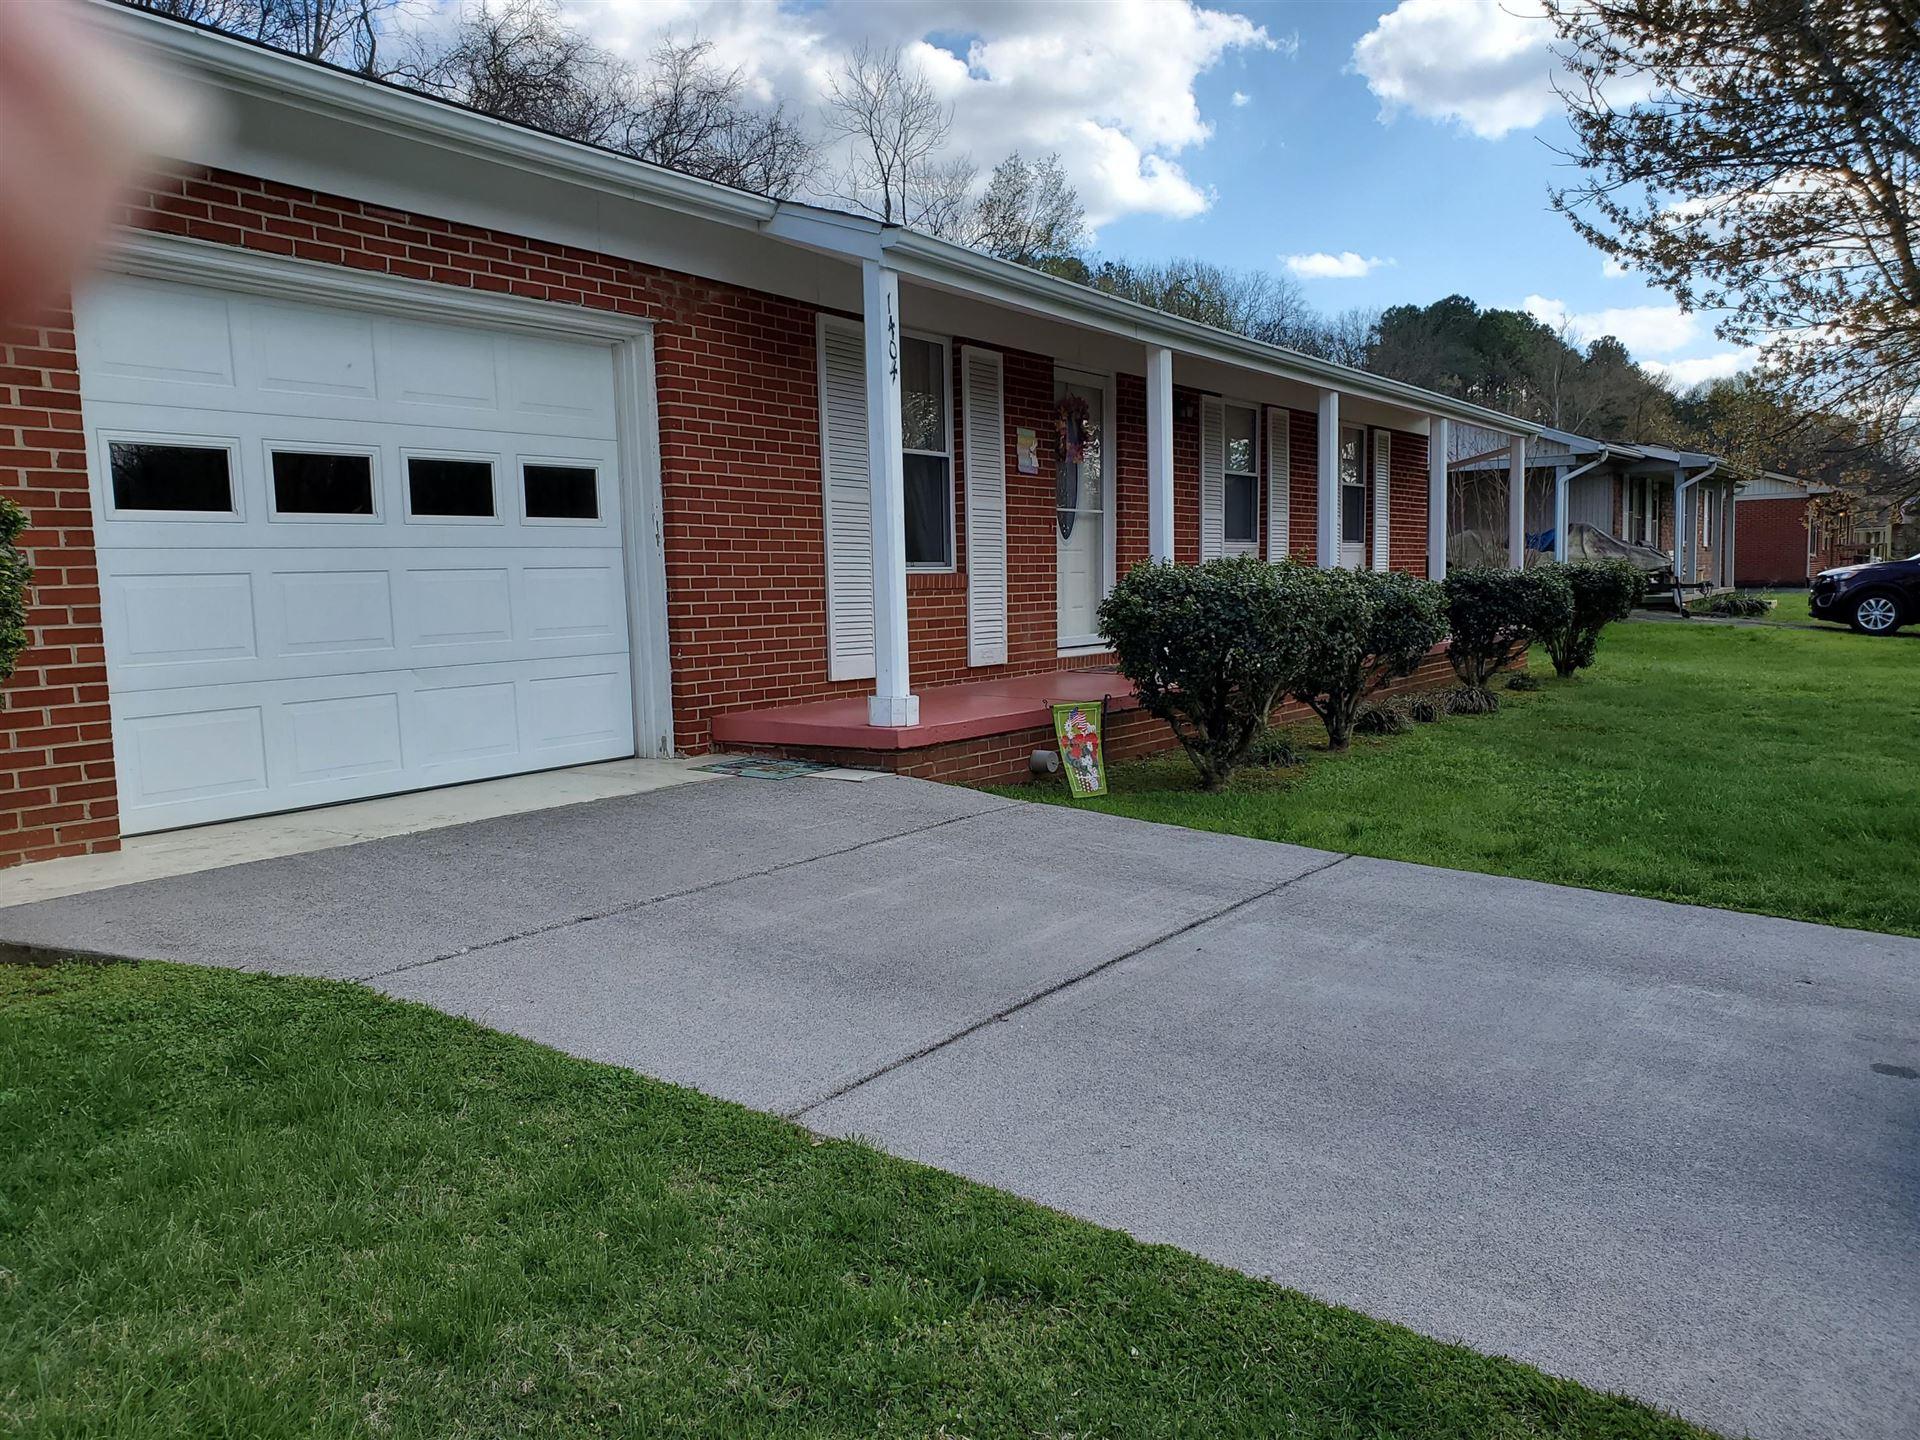 Photo of 1404 Oleary Lane, Maryville, TN 37803 (MLS # 1147882)